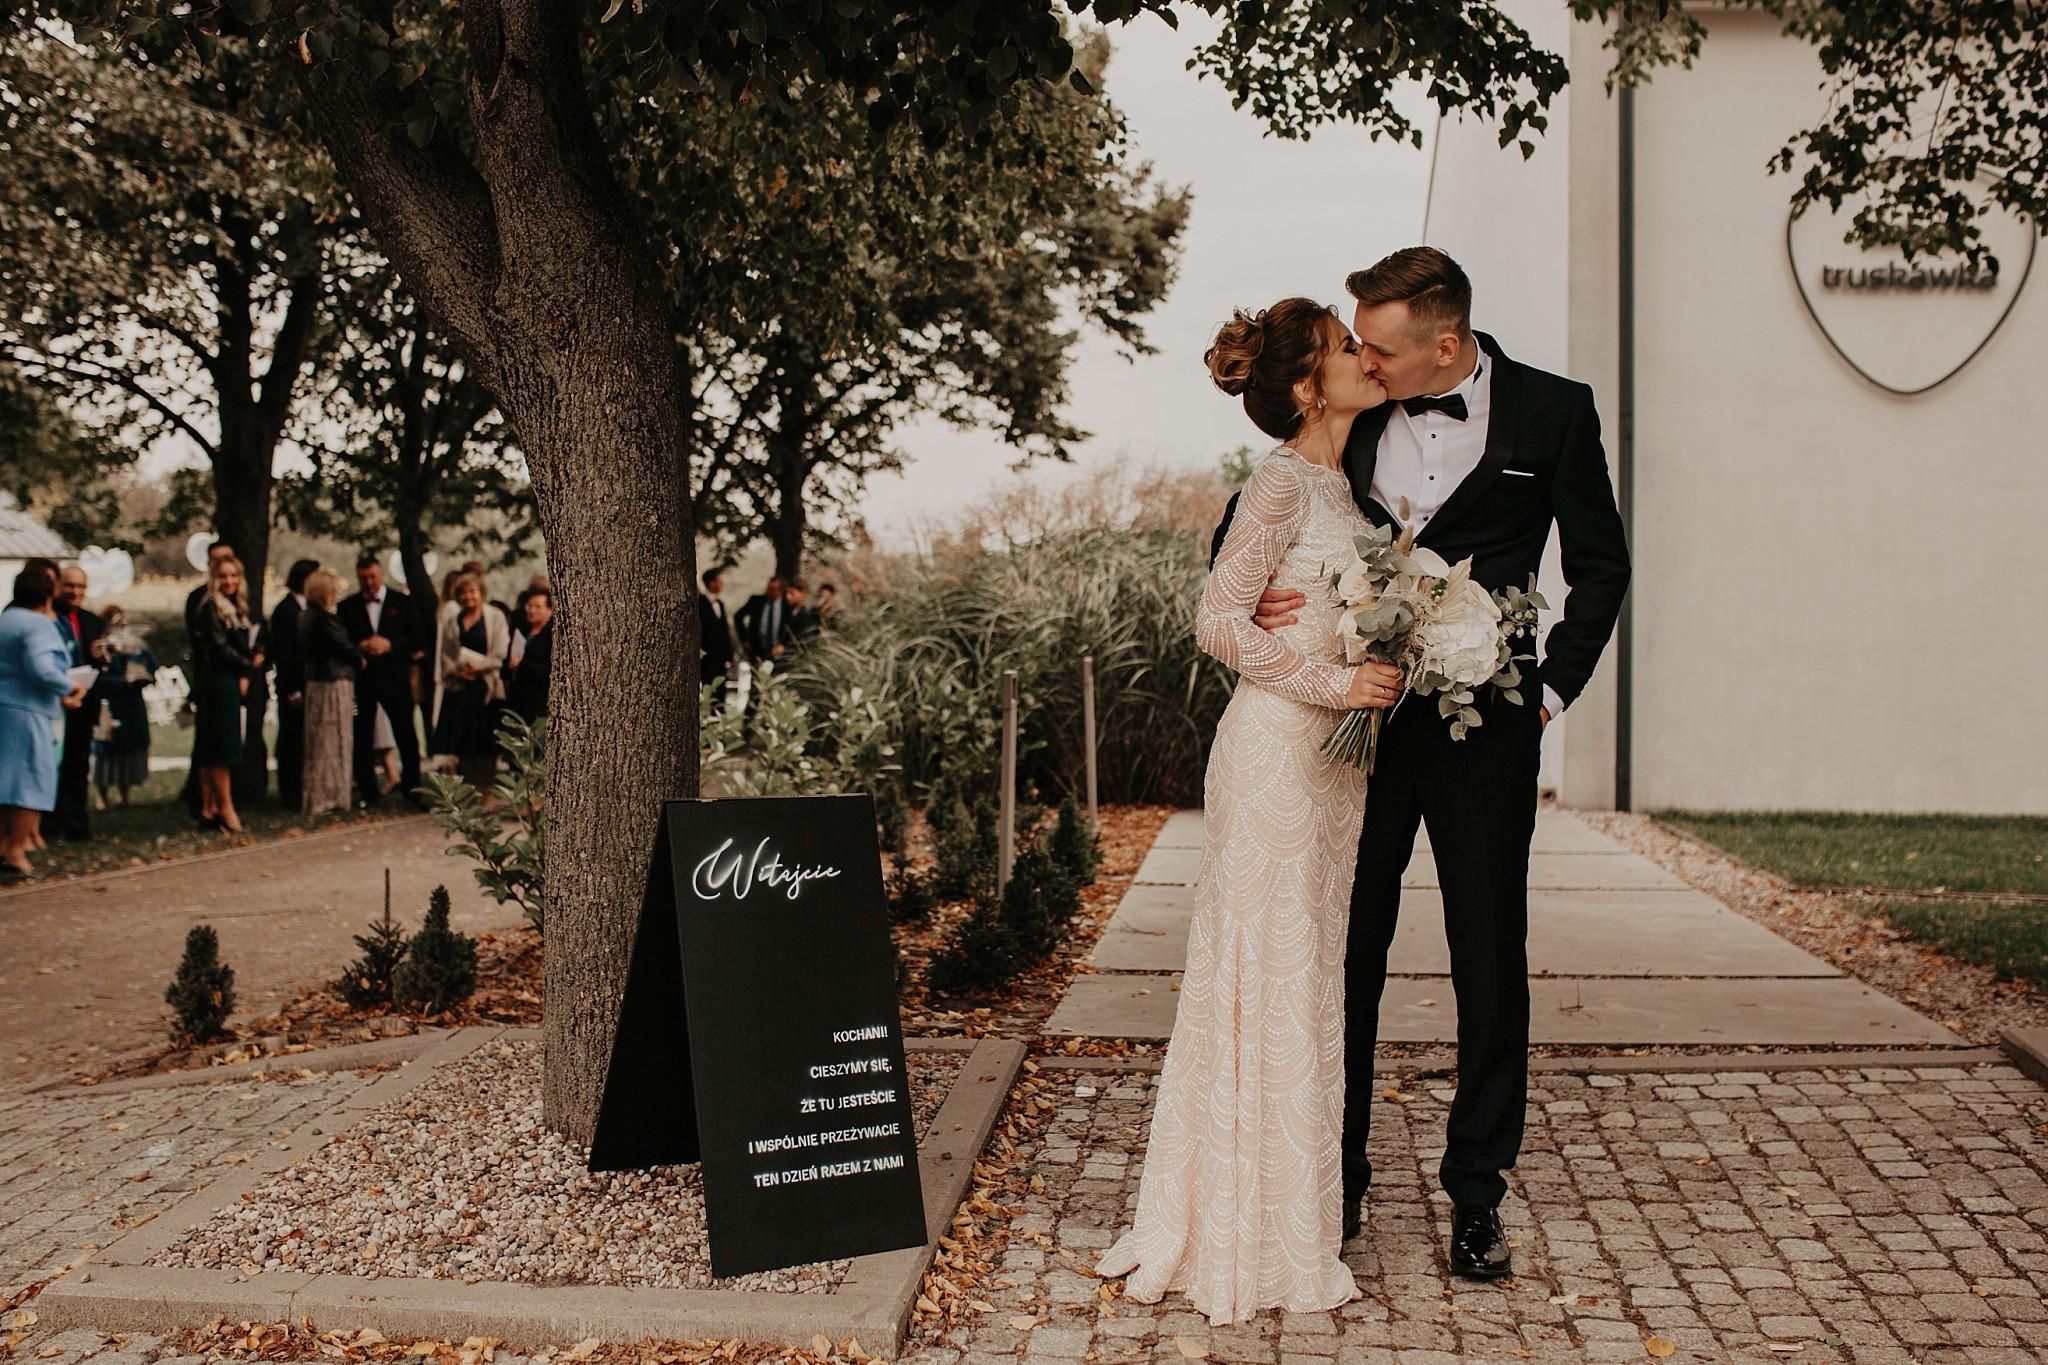 fotograf poznan wesele dobra truskawka piekne wesele pod poznaniem wesele w dobrej truskawce piekna para mloda slub marzen slub koronawirus slub listopad wesele koronawirus 255